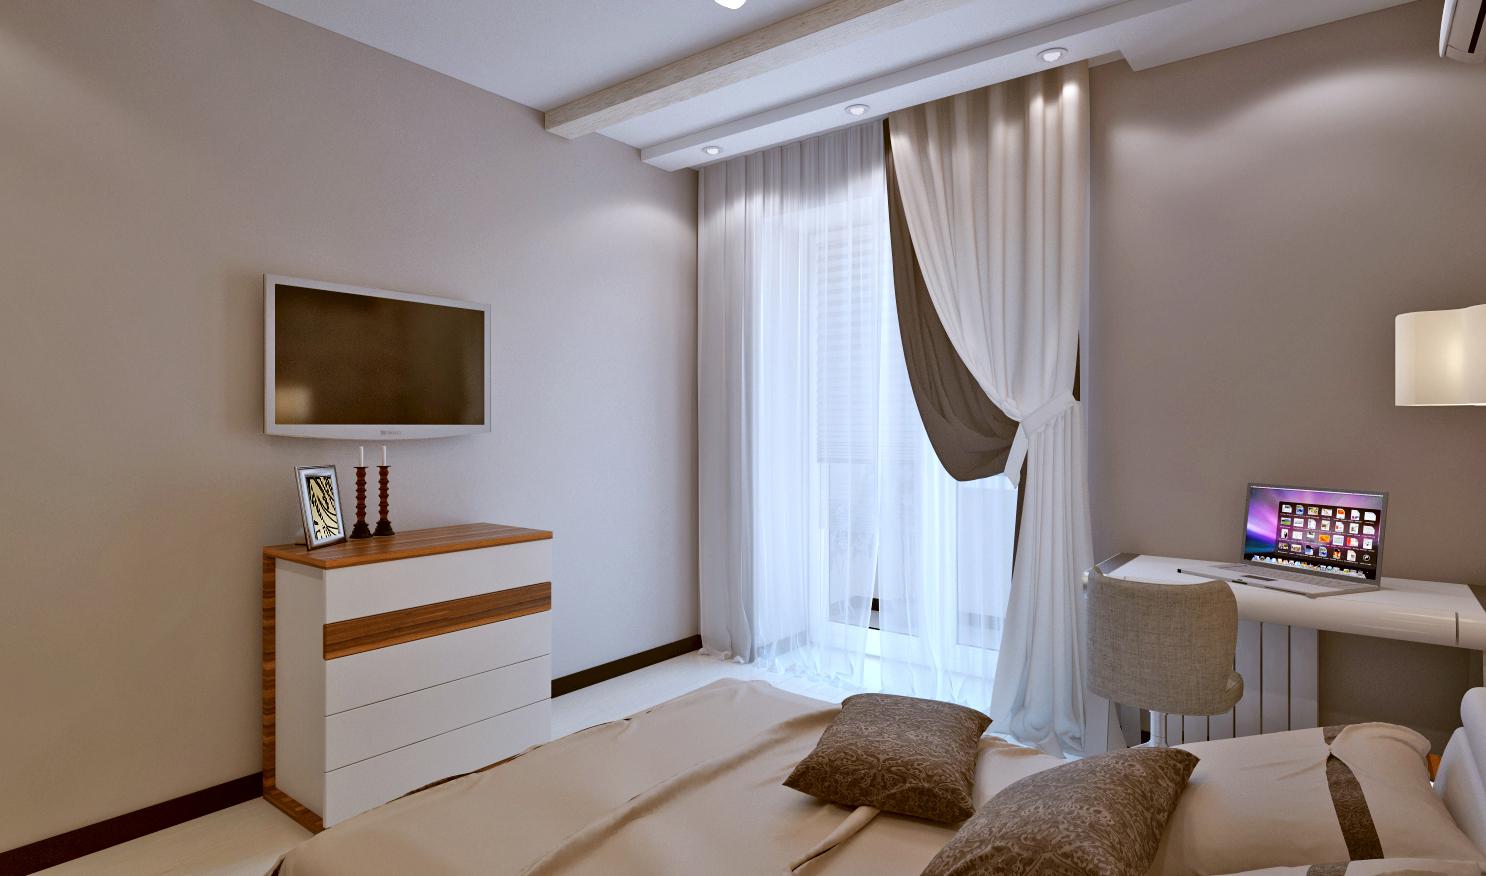 Дизайн проект спальни фото